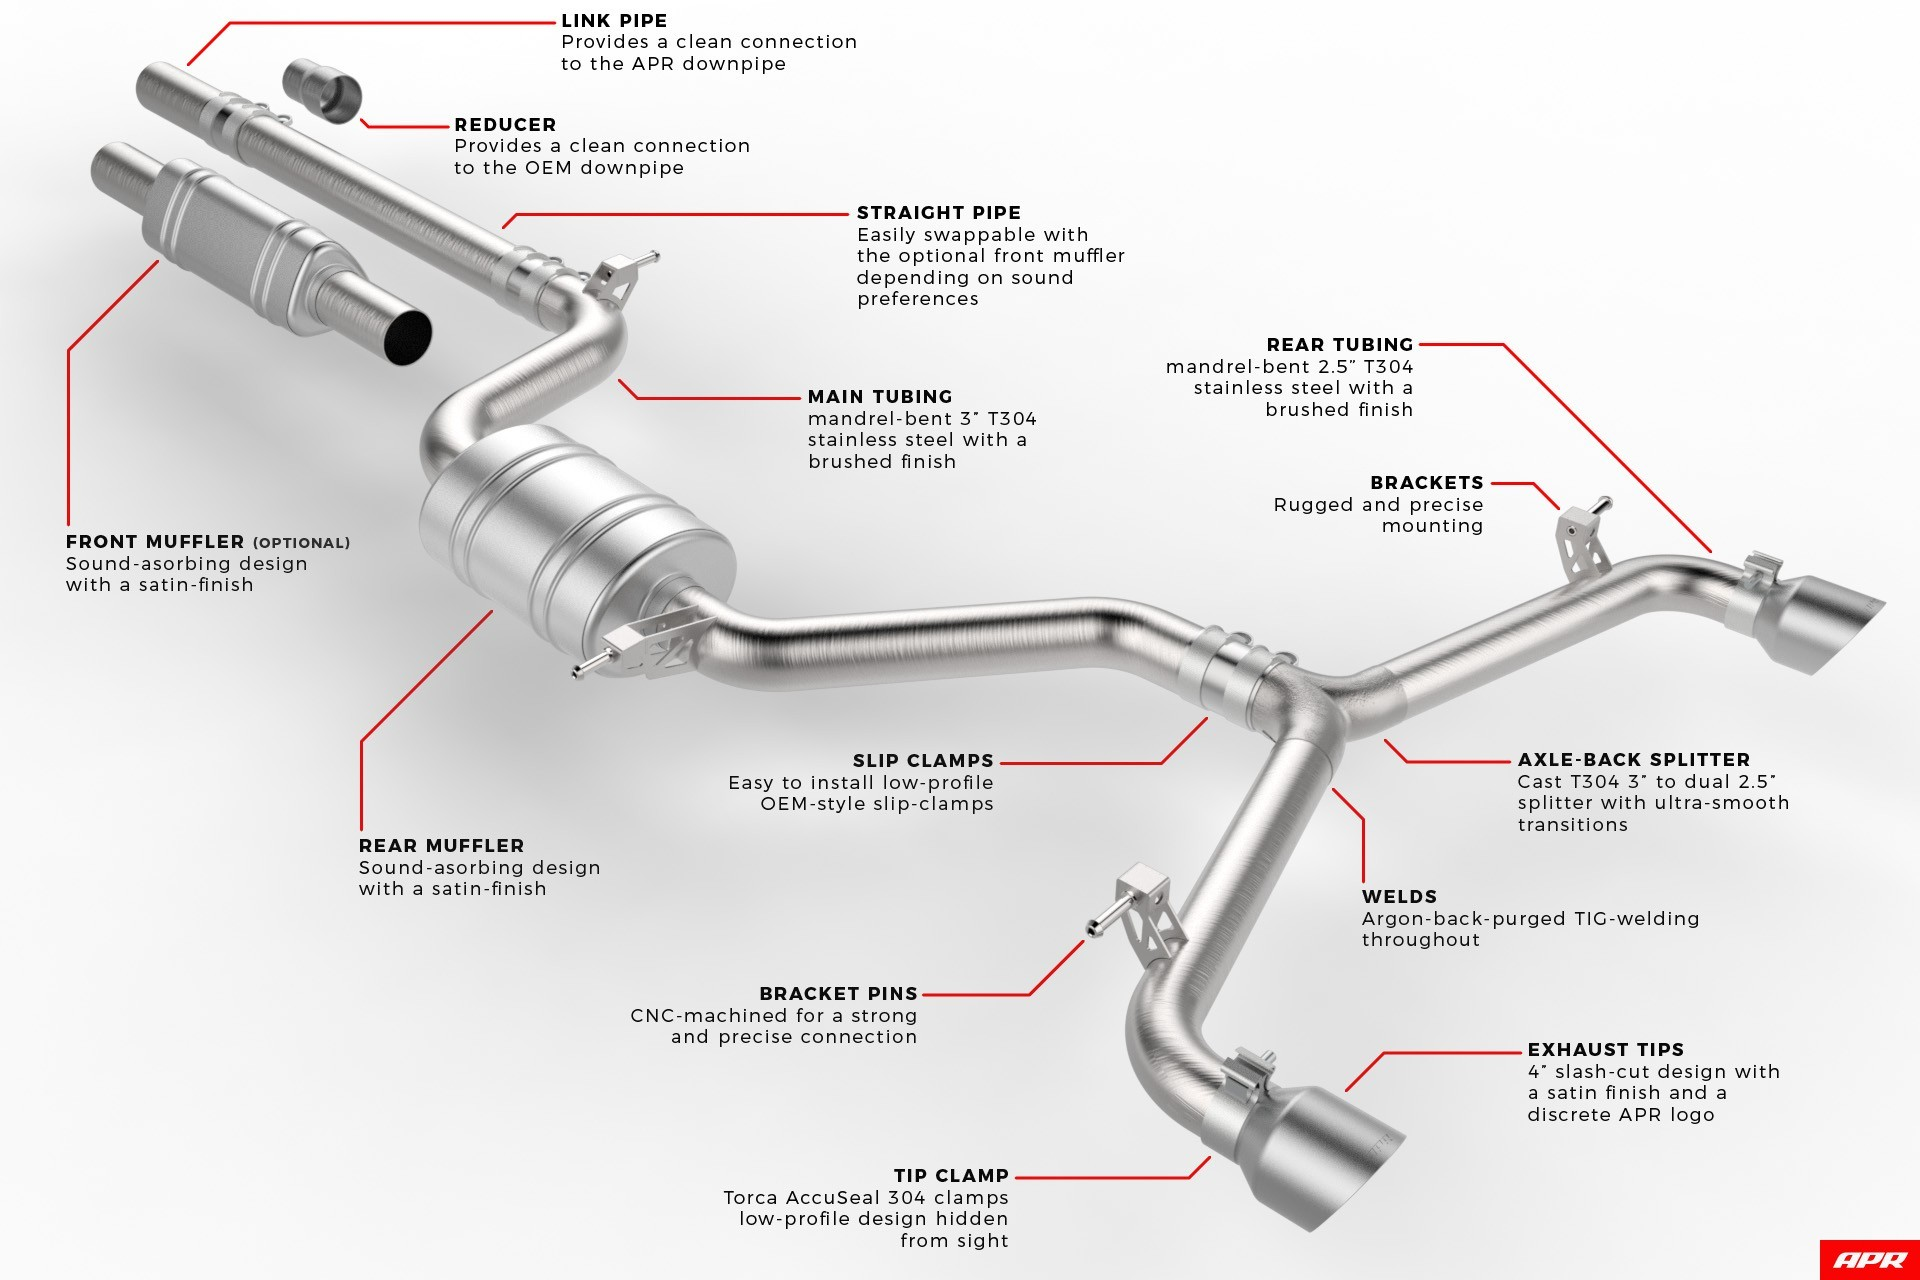 Car Exhaust Pipe Diagram | My Wiring DIagram